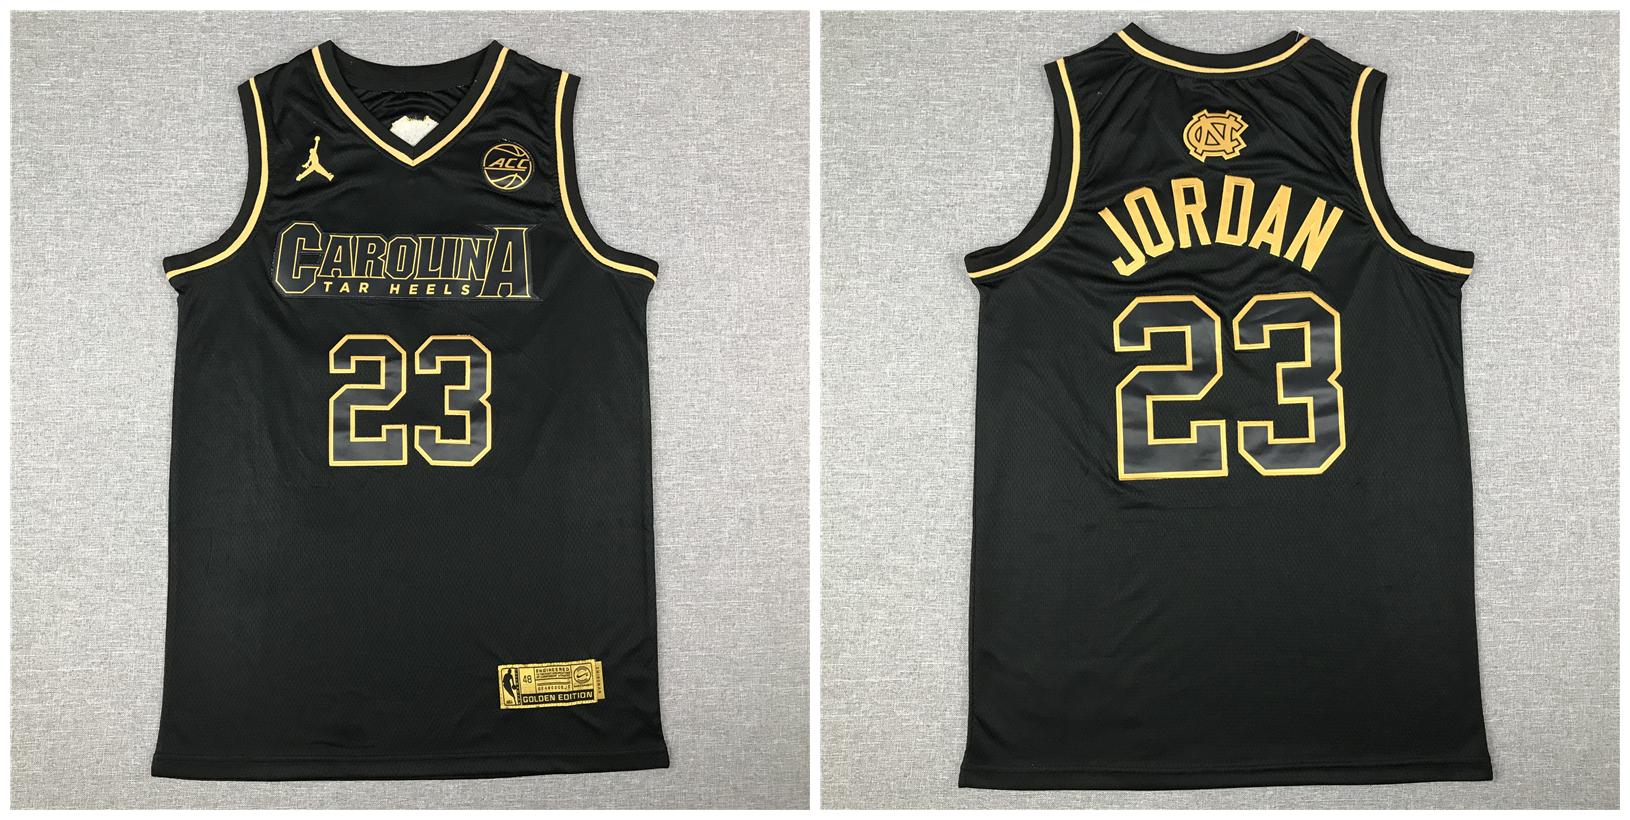 North Carolina Tar Heels 23 Michael Jordan Black Gold College Basketball Jersey